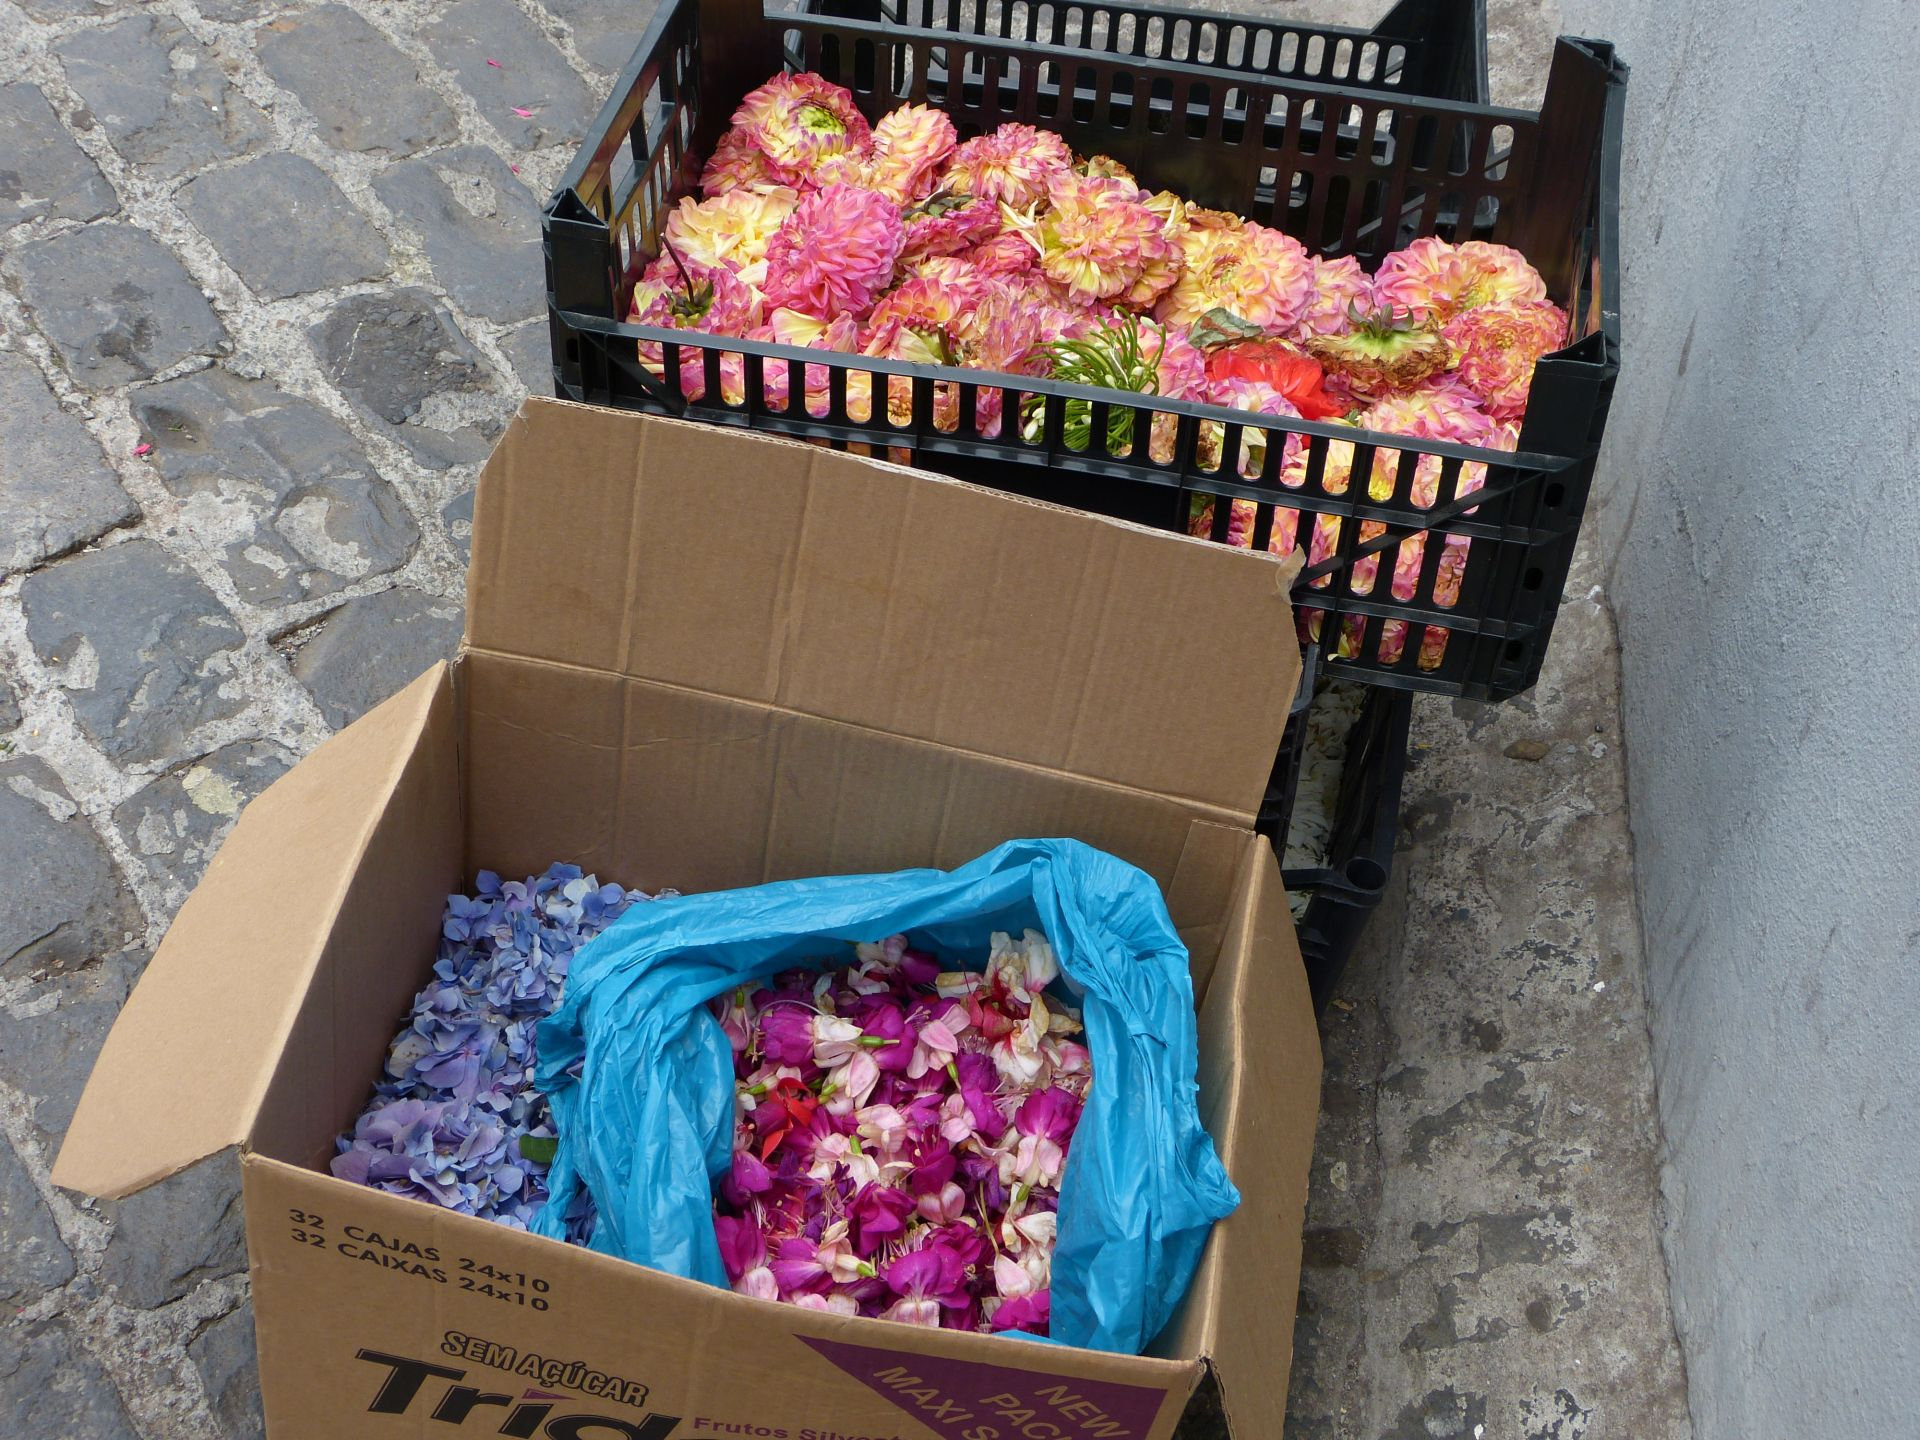 Kartonweise Blüten!